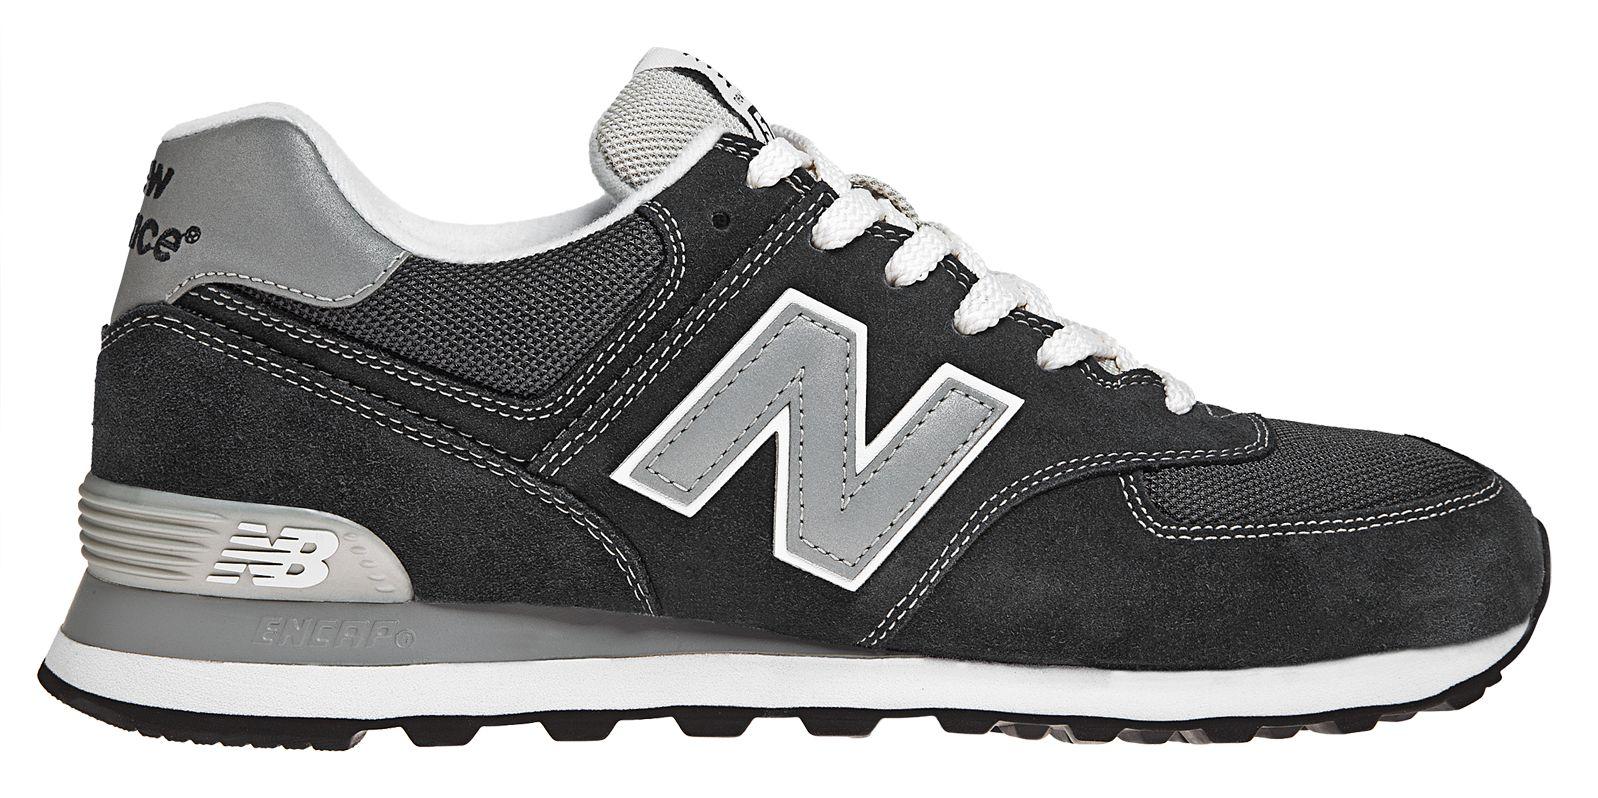 new arrival c5884 efb10 New Balance 574 Men's NB Numeric Shoes - ML574KWS